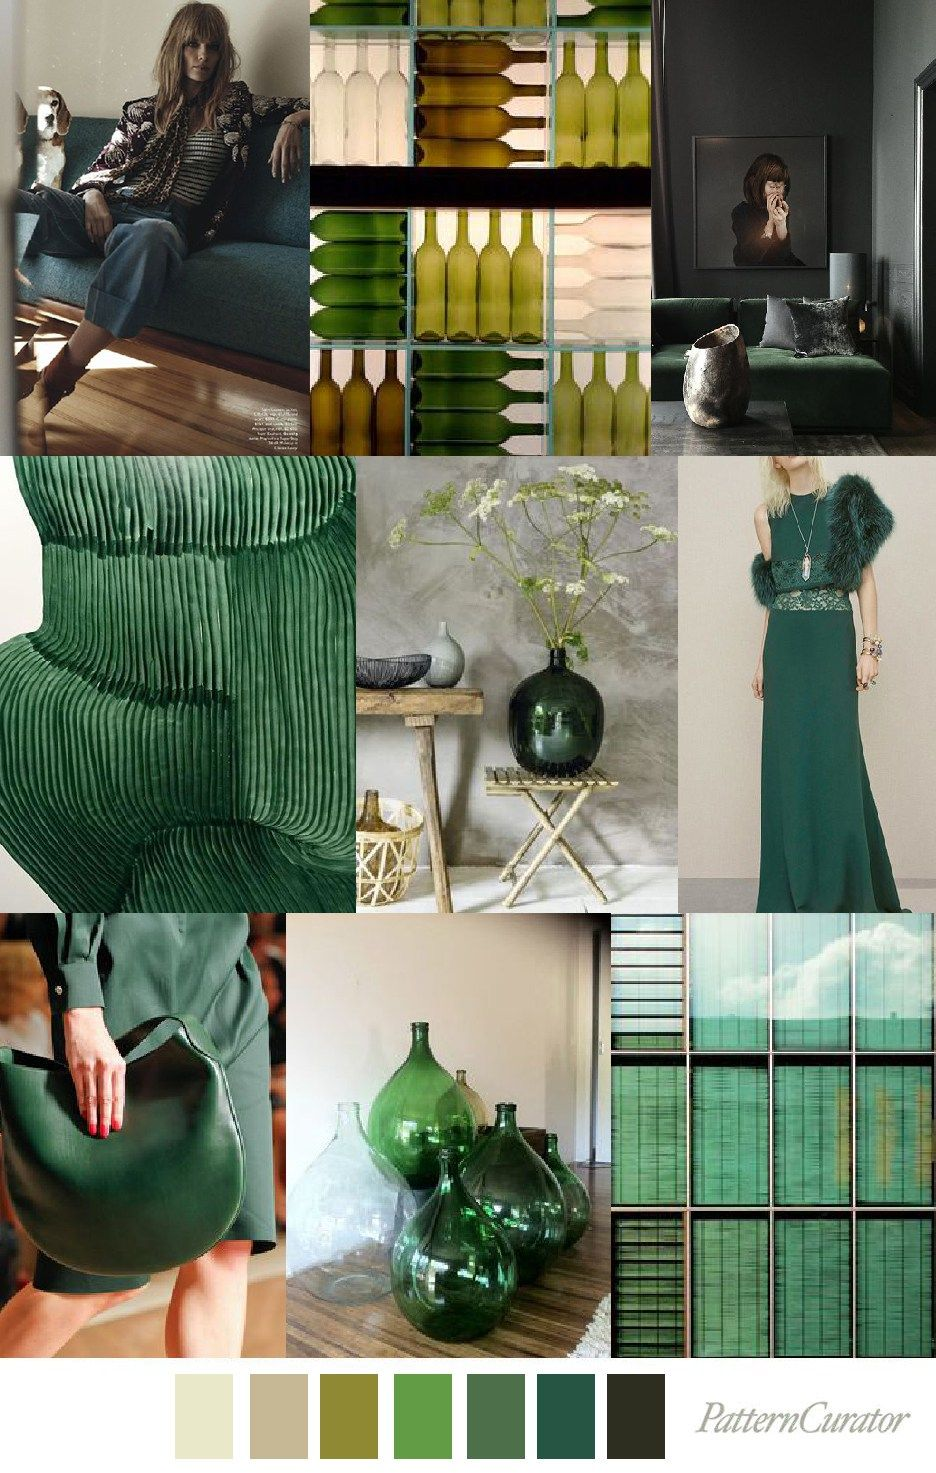 viagra femme farbtrends fw 18 19 pinterest farben. Black Bedroom Furniture Sets. Home Design Ideas